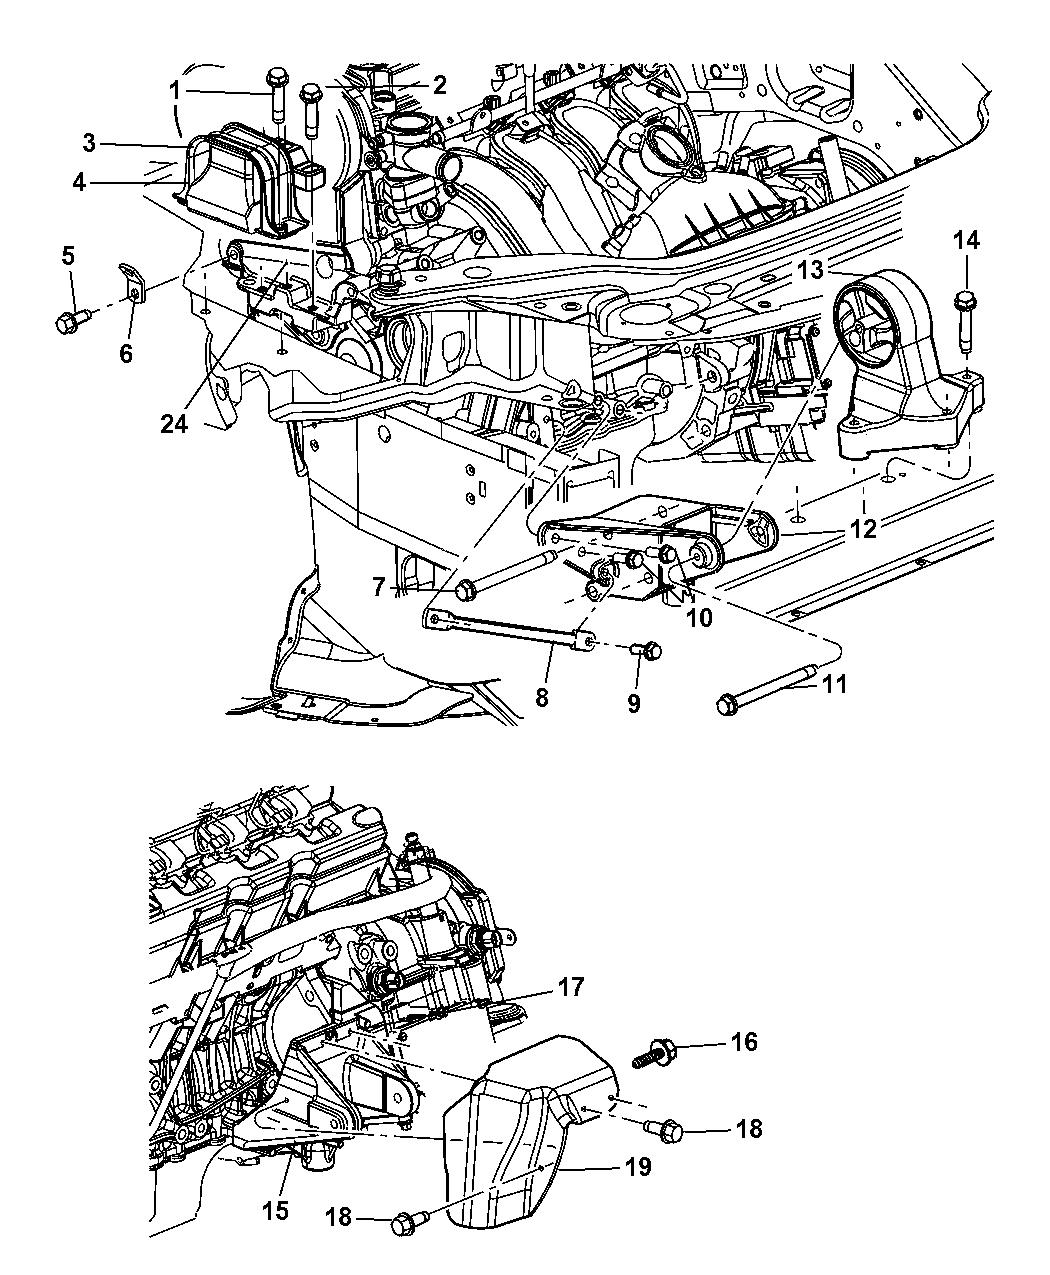 2006 Dodge Stratus Engine Diagram - Dc17 Wiring Diagram -  power-poles.yenpancane.jeanjaures37.frWiring Diagram Resource